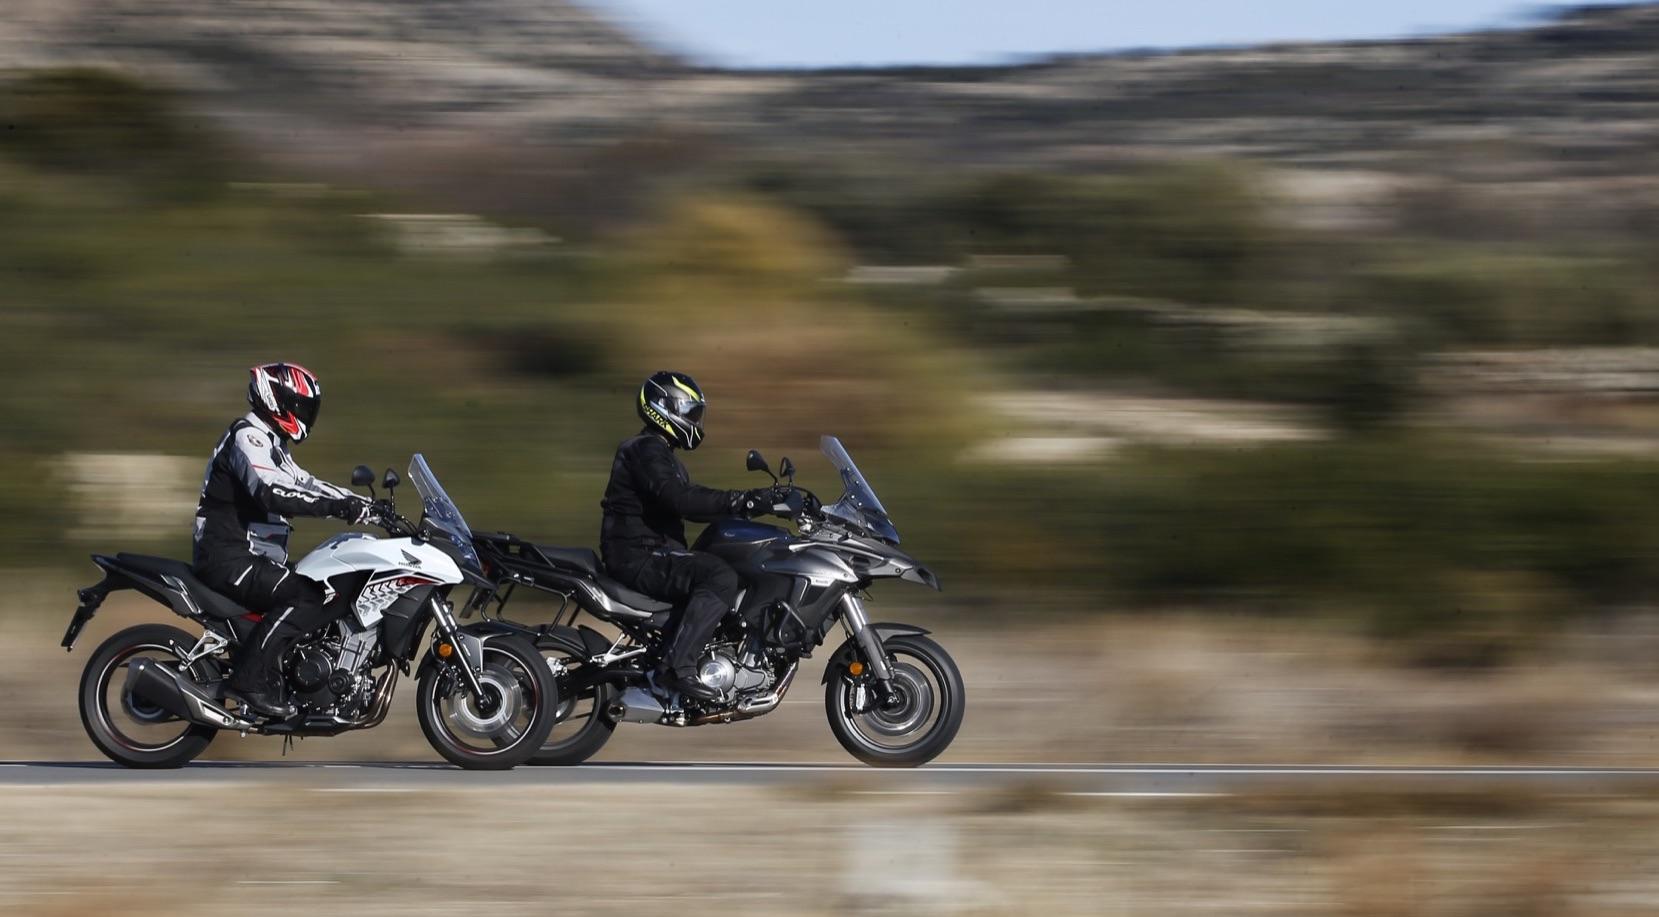 Honda CB500X vs. Benelli TRK 502, comparativa trail para A2